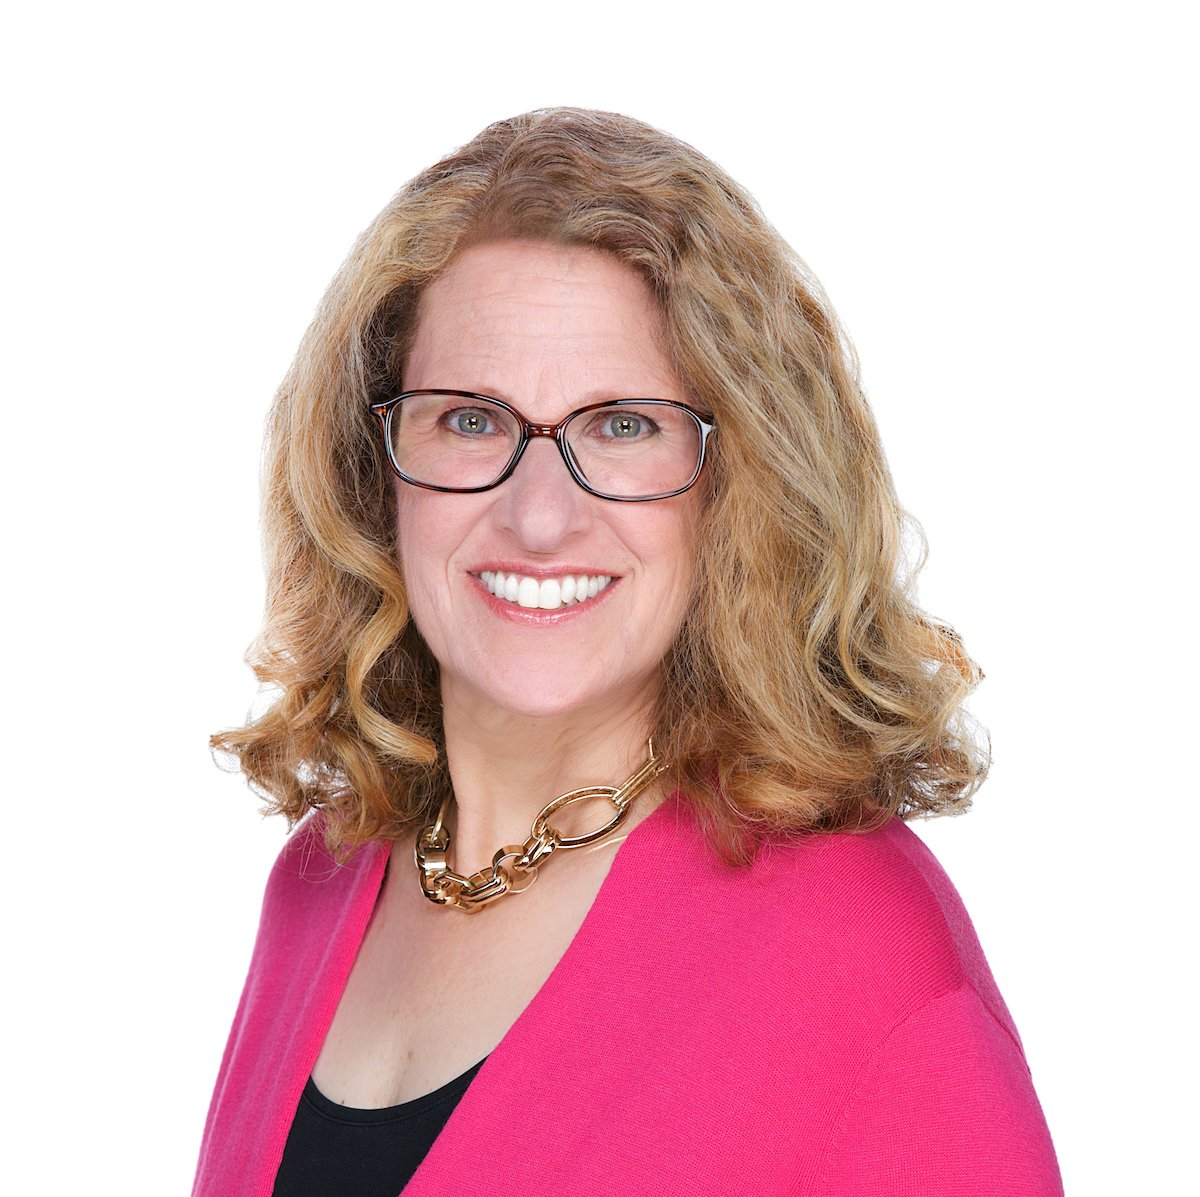 Headshot of JAMIE GOLD, CKD, CAPS, MCTWC, Kitchen, Bath and Wellness Design Consultant